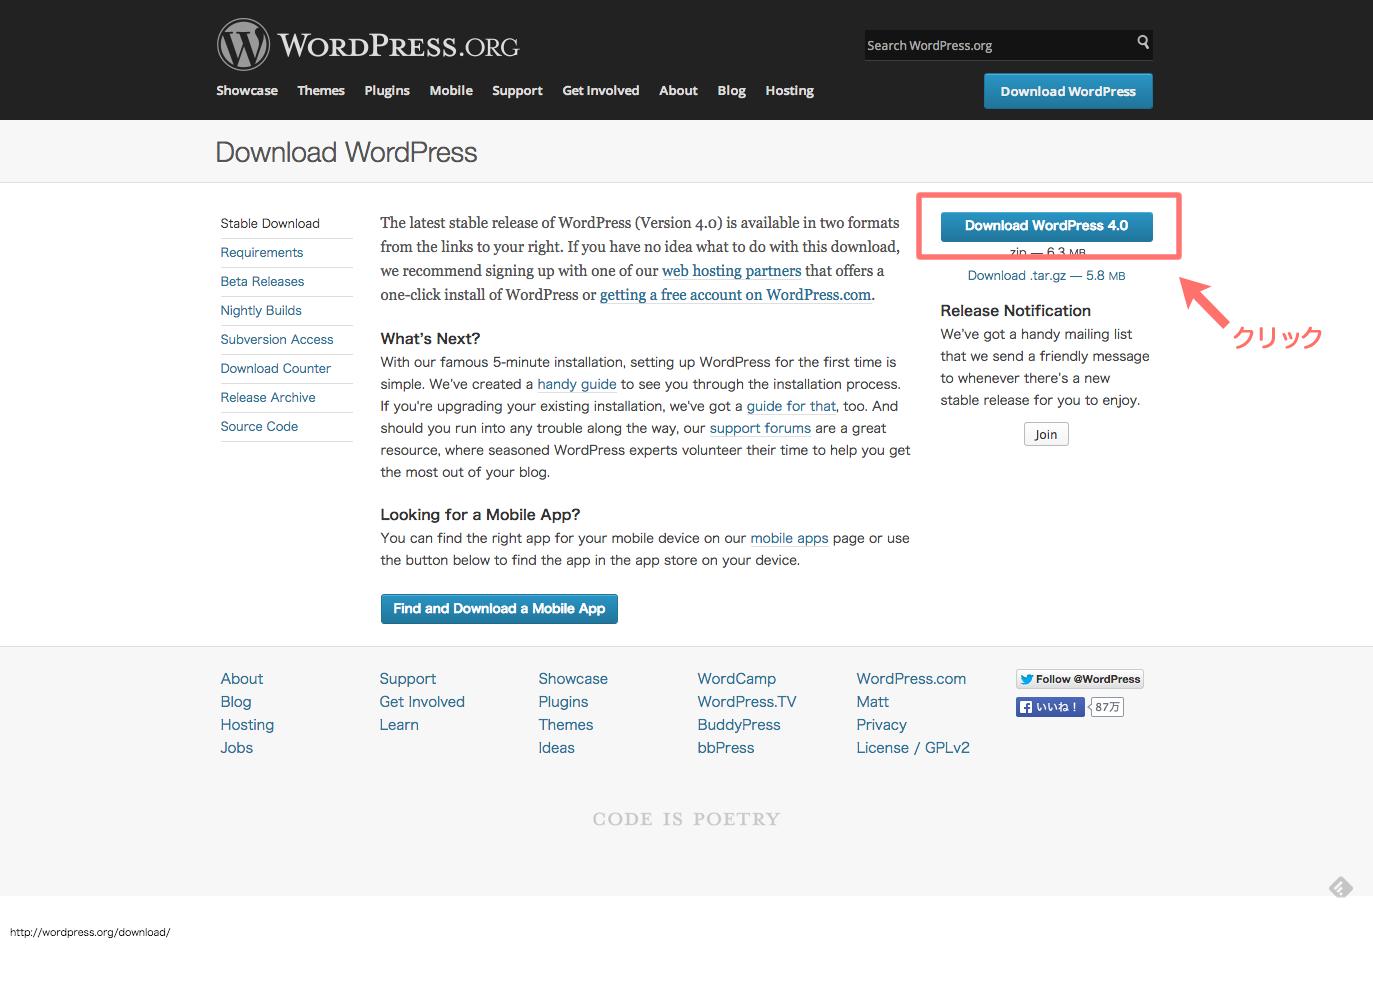 wordpress4.0_1